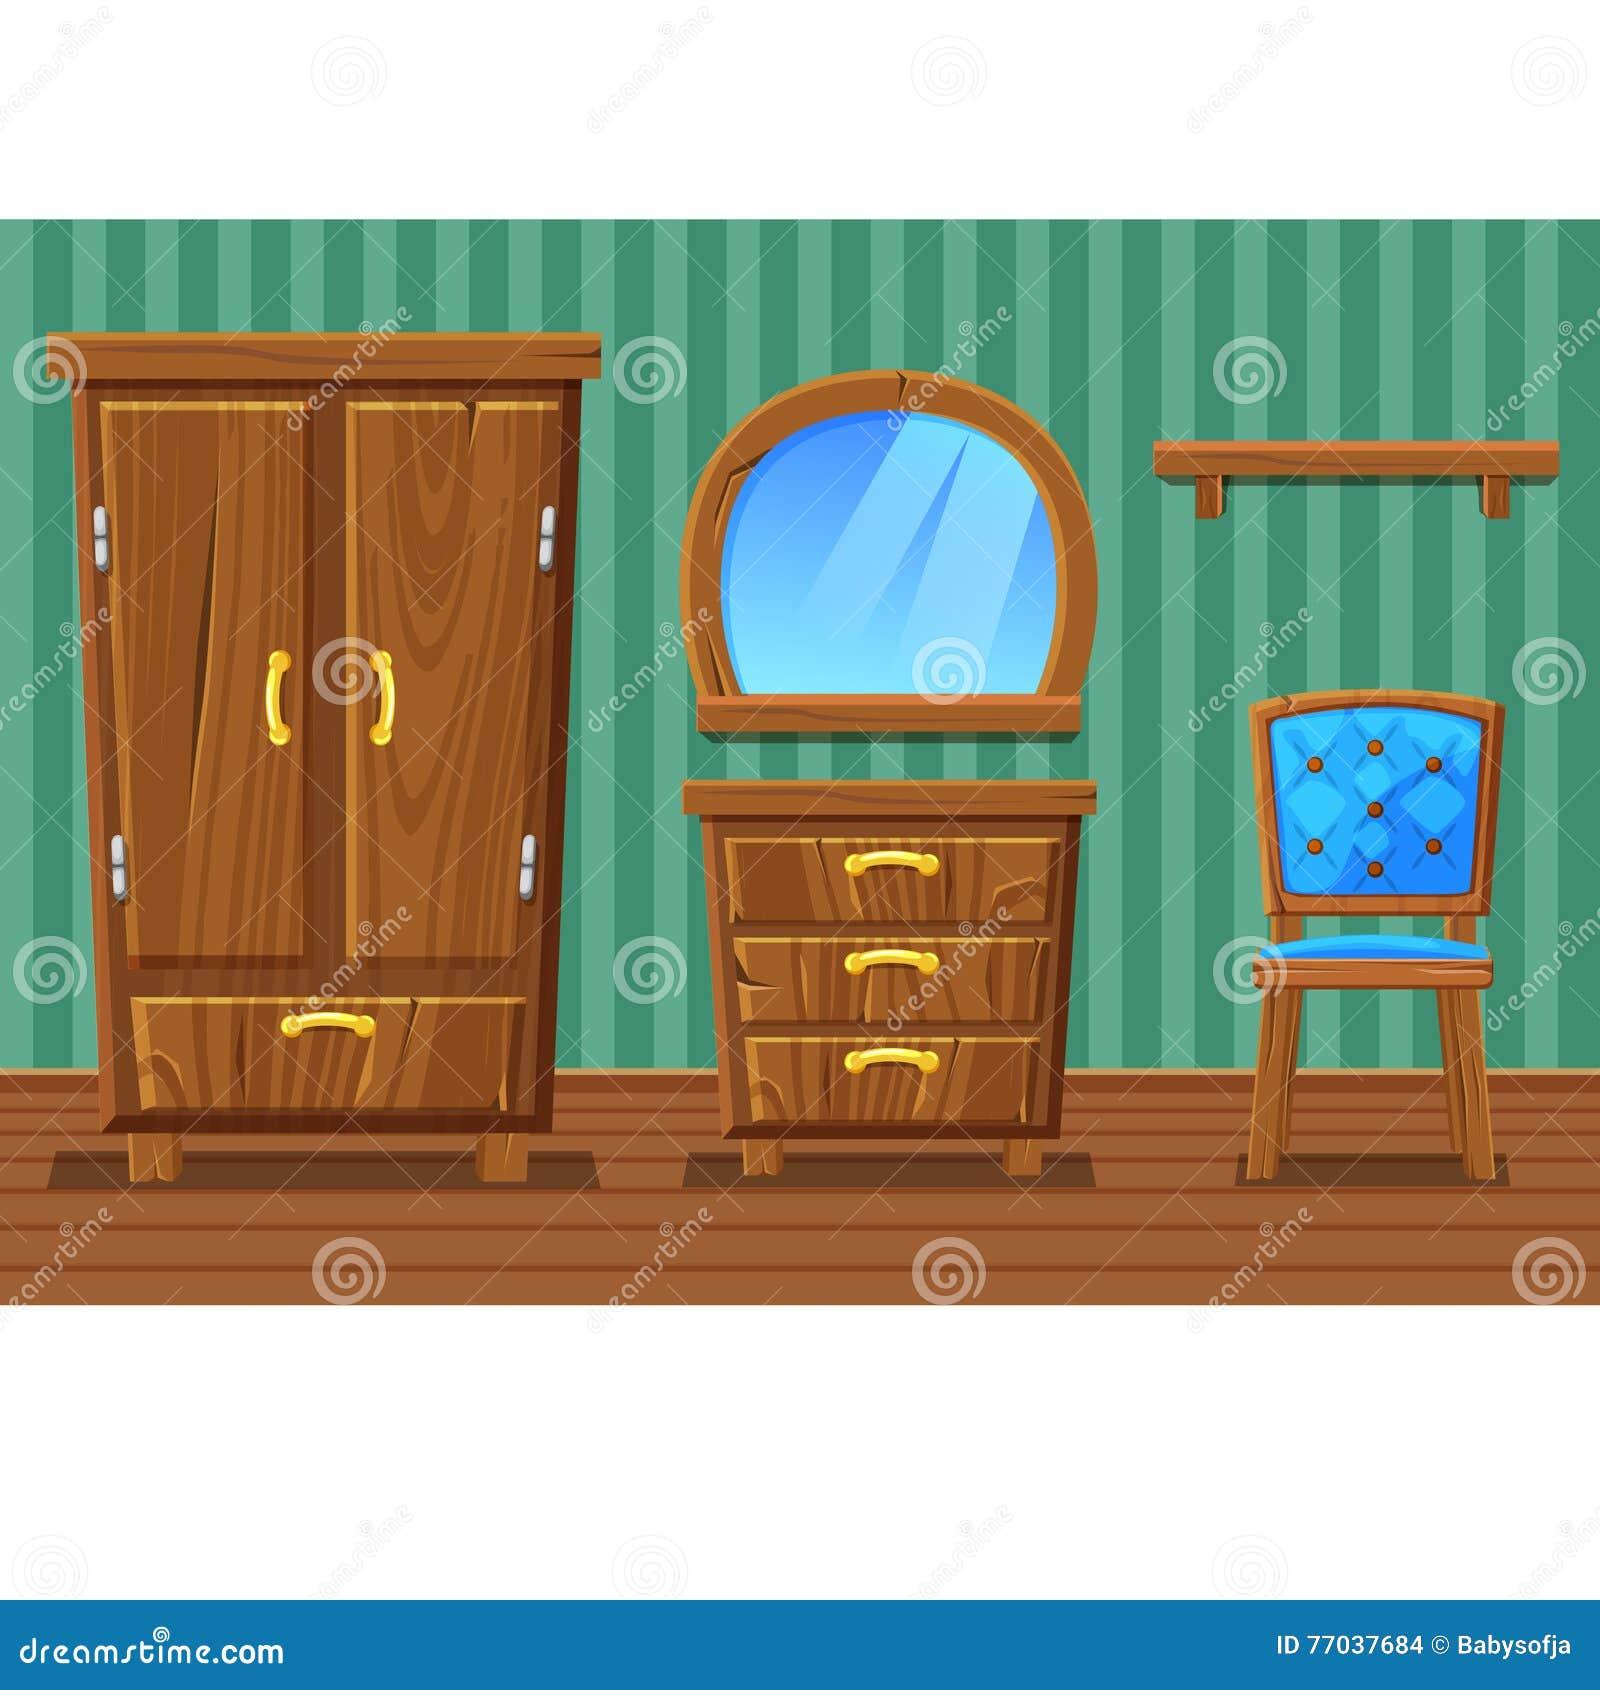 Set cartoon funny wooden furniture living room stock - Living room wooden furniture photos ...